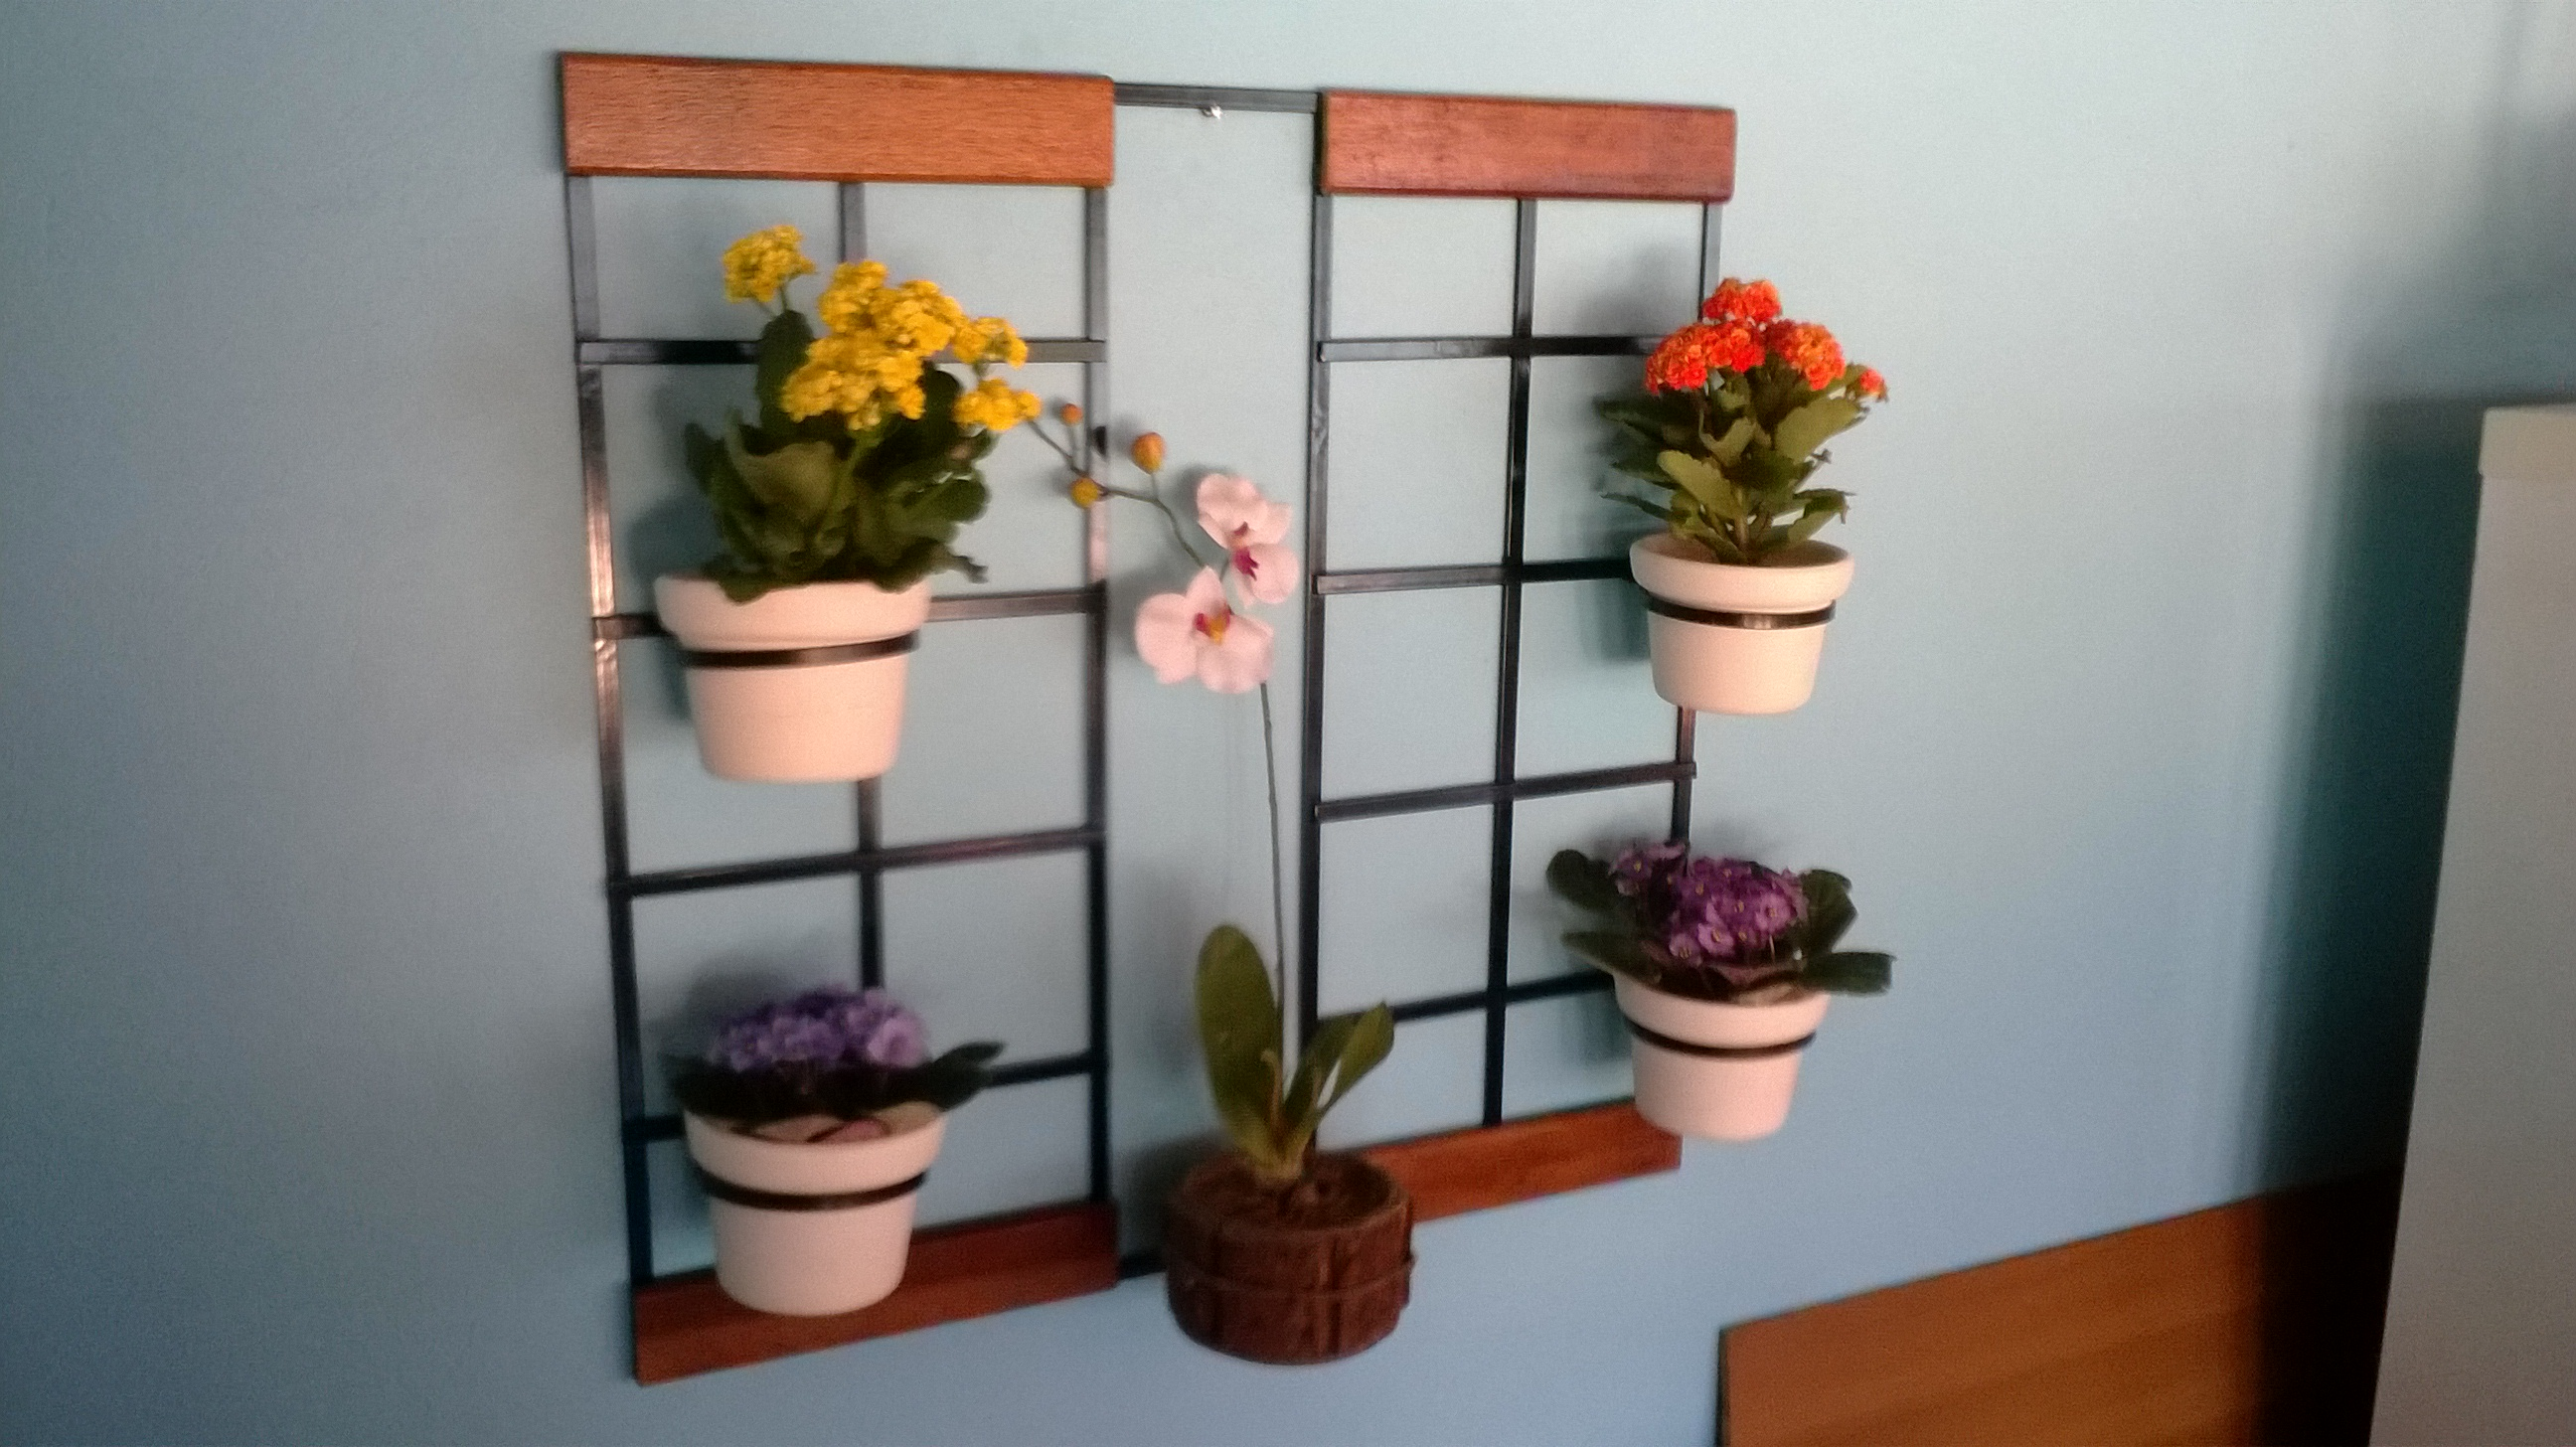 trelica jardim vertical:trelica para jardim vertical 75x75cm trelica para jardim vertical